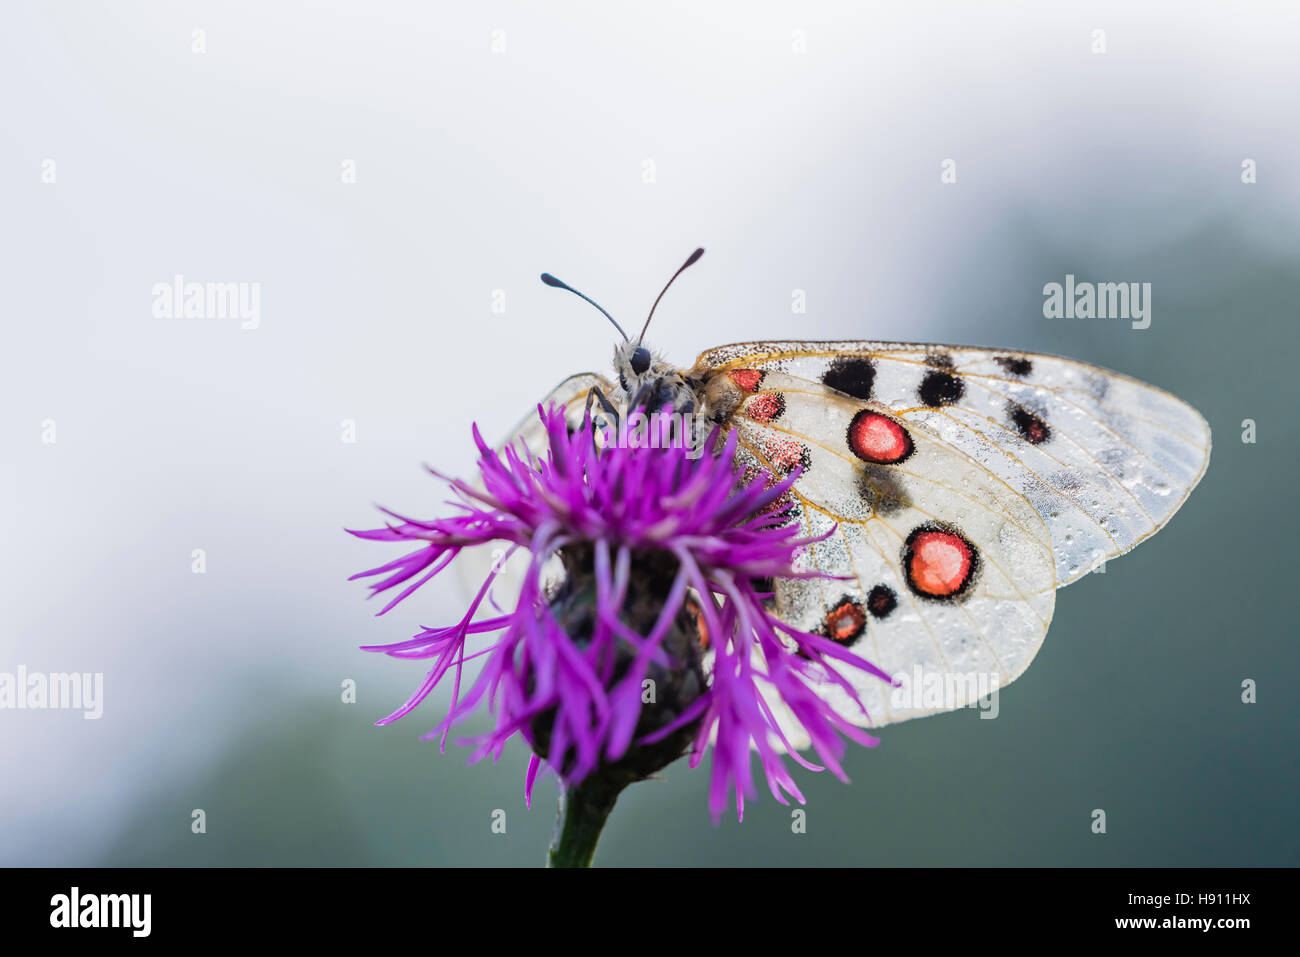 Roter Apollofalter Weibchen, Parnassius apollo lithographicus, Female Apollo Butterfly Stock Photo